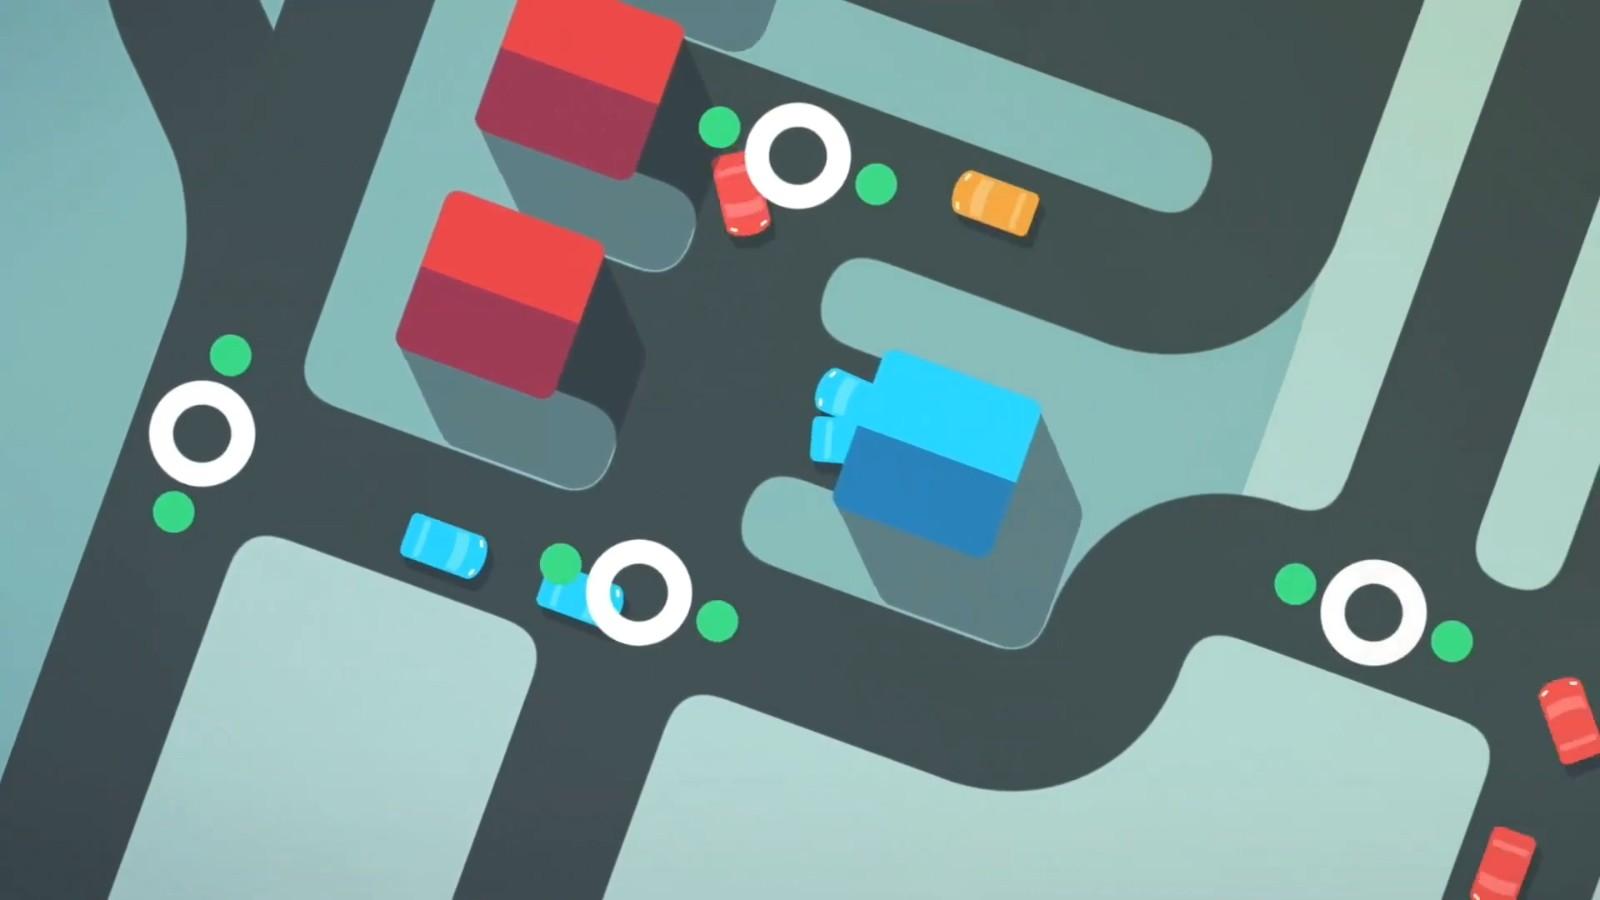 IOS独占策略模拟游戏《迷你高速公路》7月20日登陆Steam